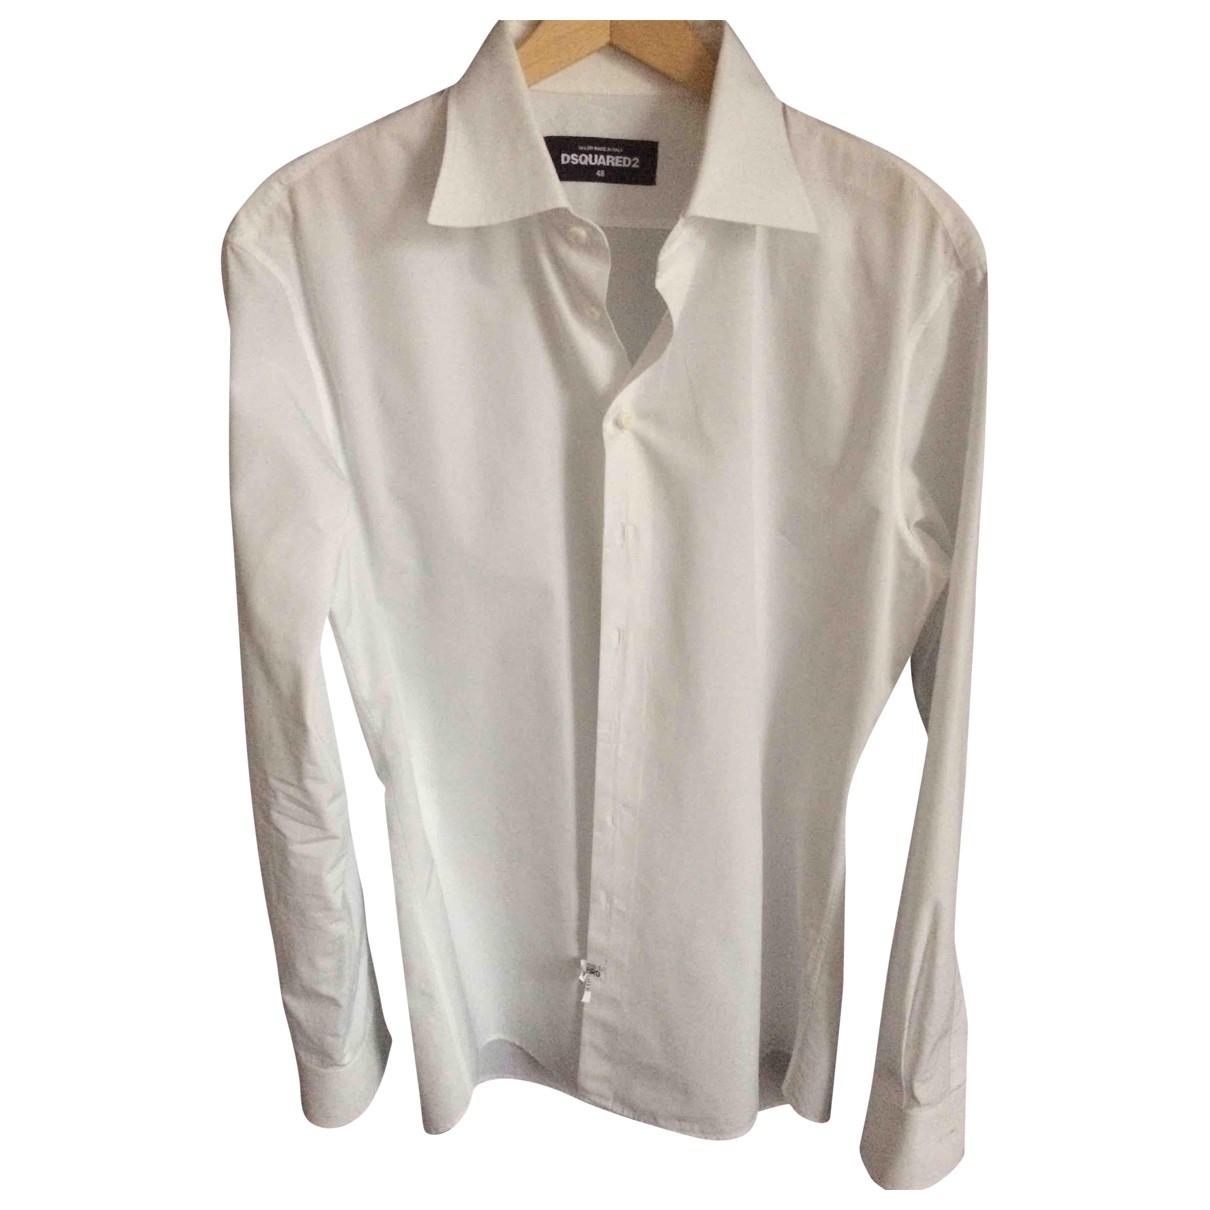 Dsquared2 \N White Cotton Shirts for Men 40 EU (tour de cou / collar)